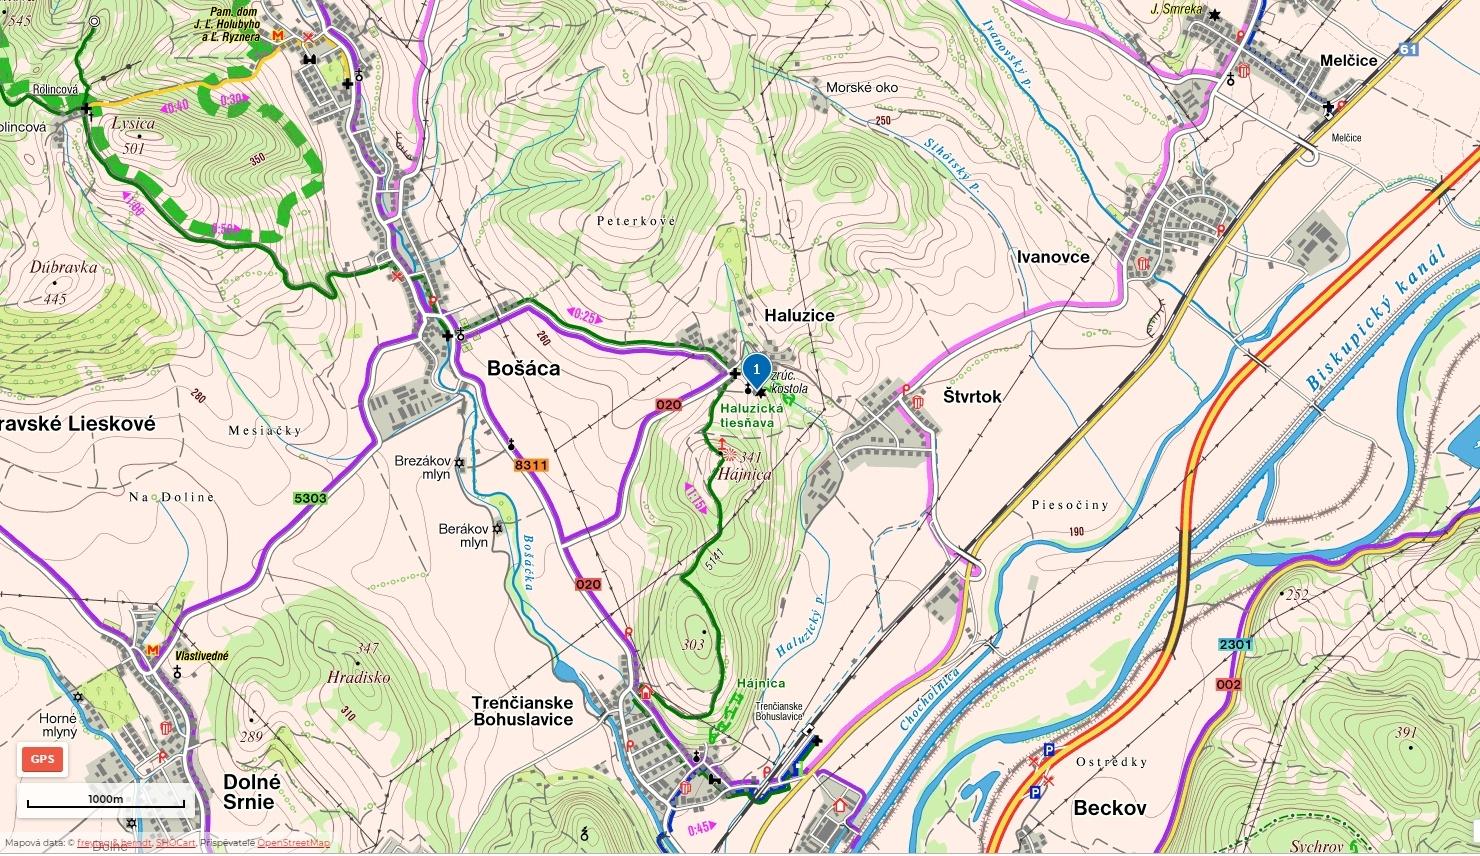 08-Romansky-kostolik-Haluzice-mapa